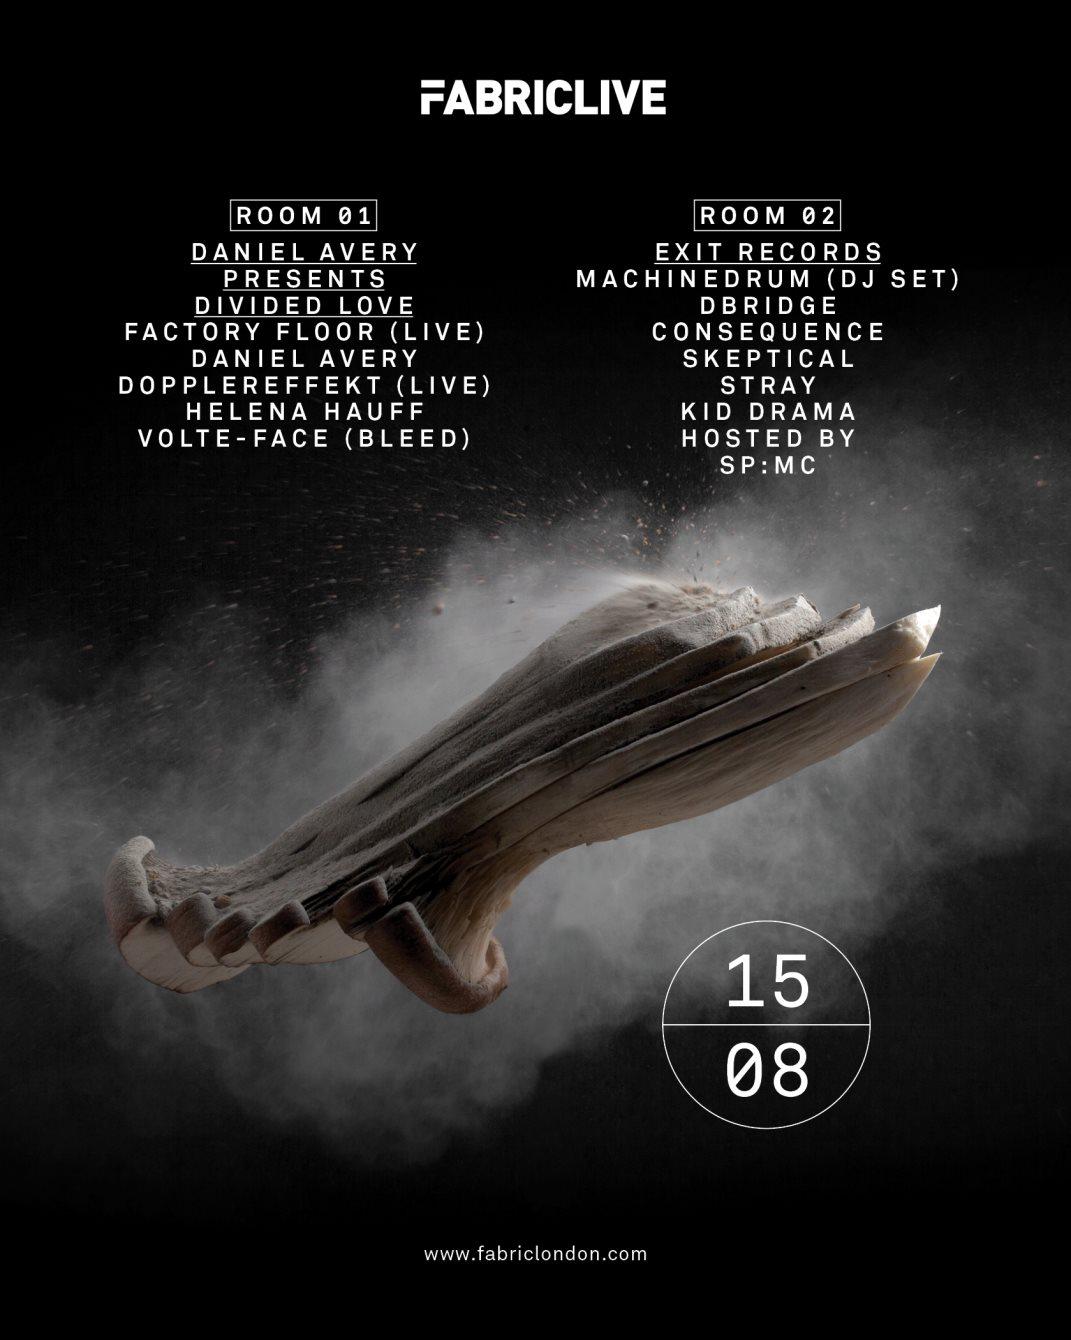 Fabriclive: Factory Floor Live, Dopplereffekt Live & Exit Records - Flyer front